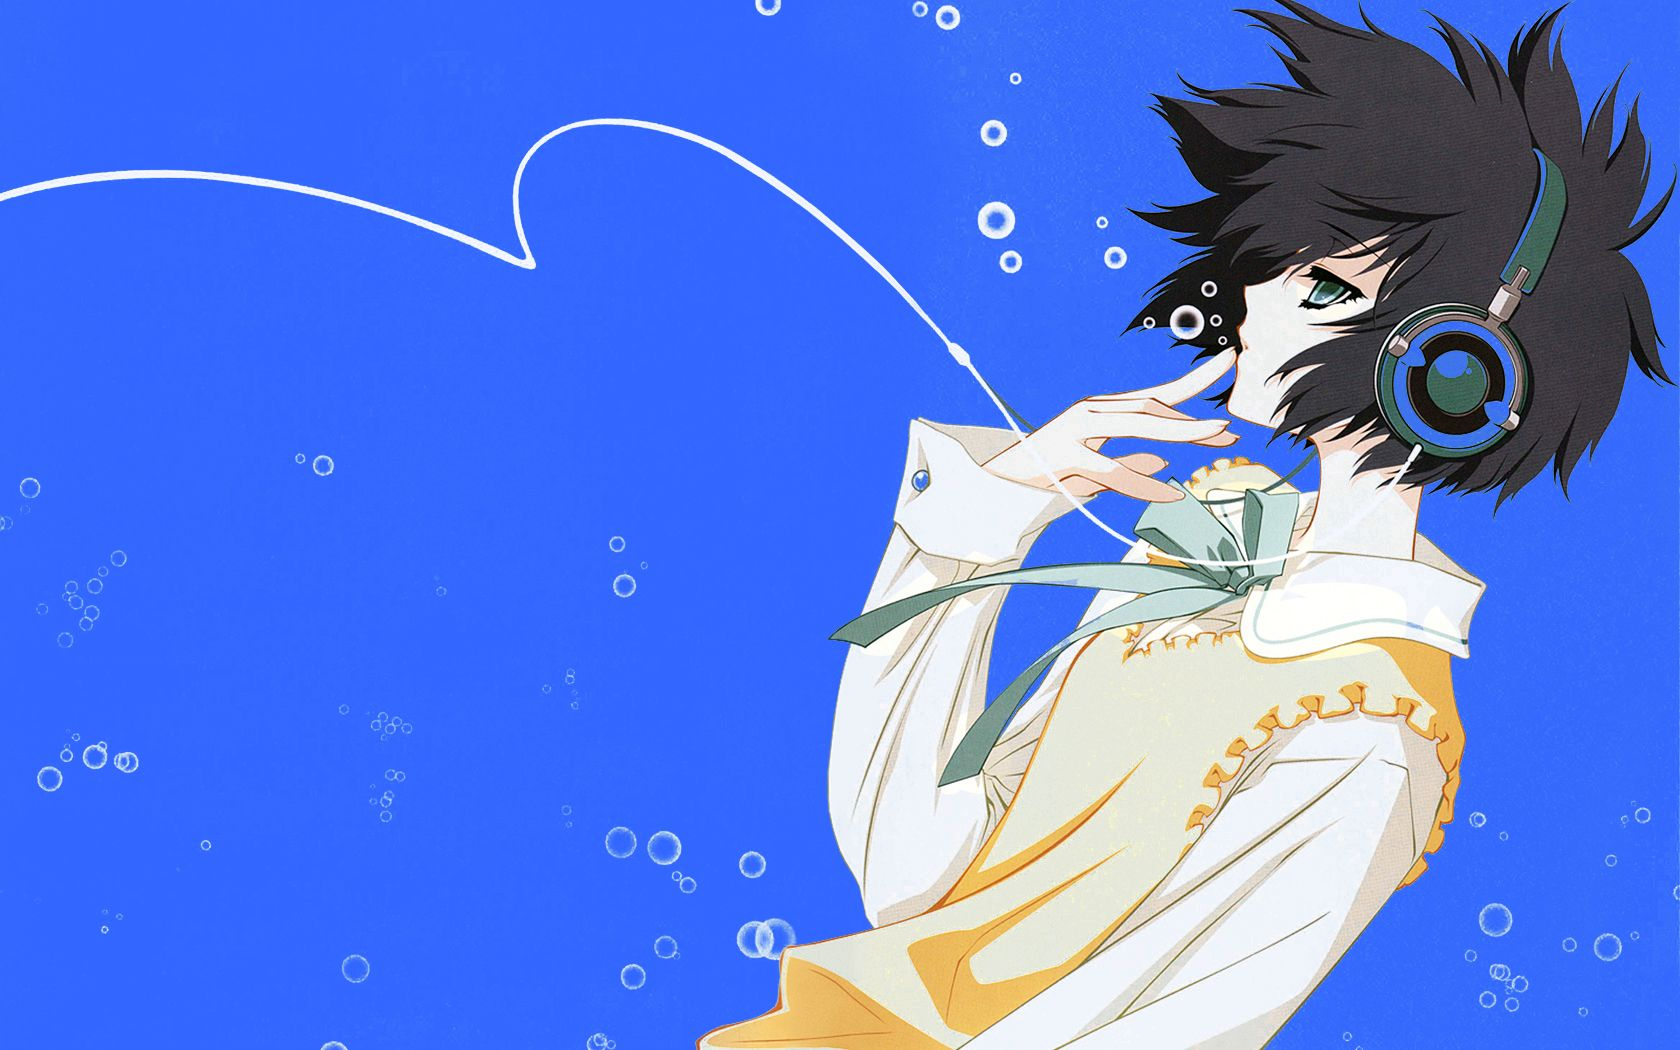 Anime Headphones Wallpapers - Top Free Anime Headphones ...